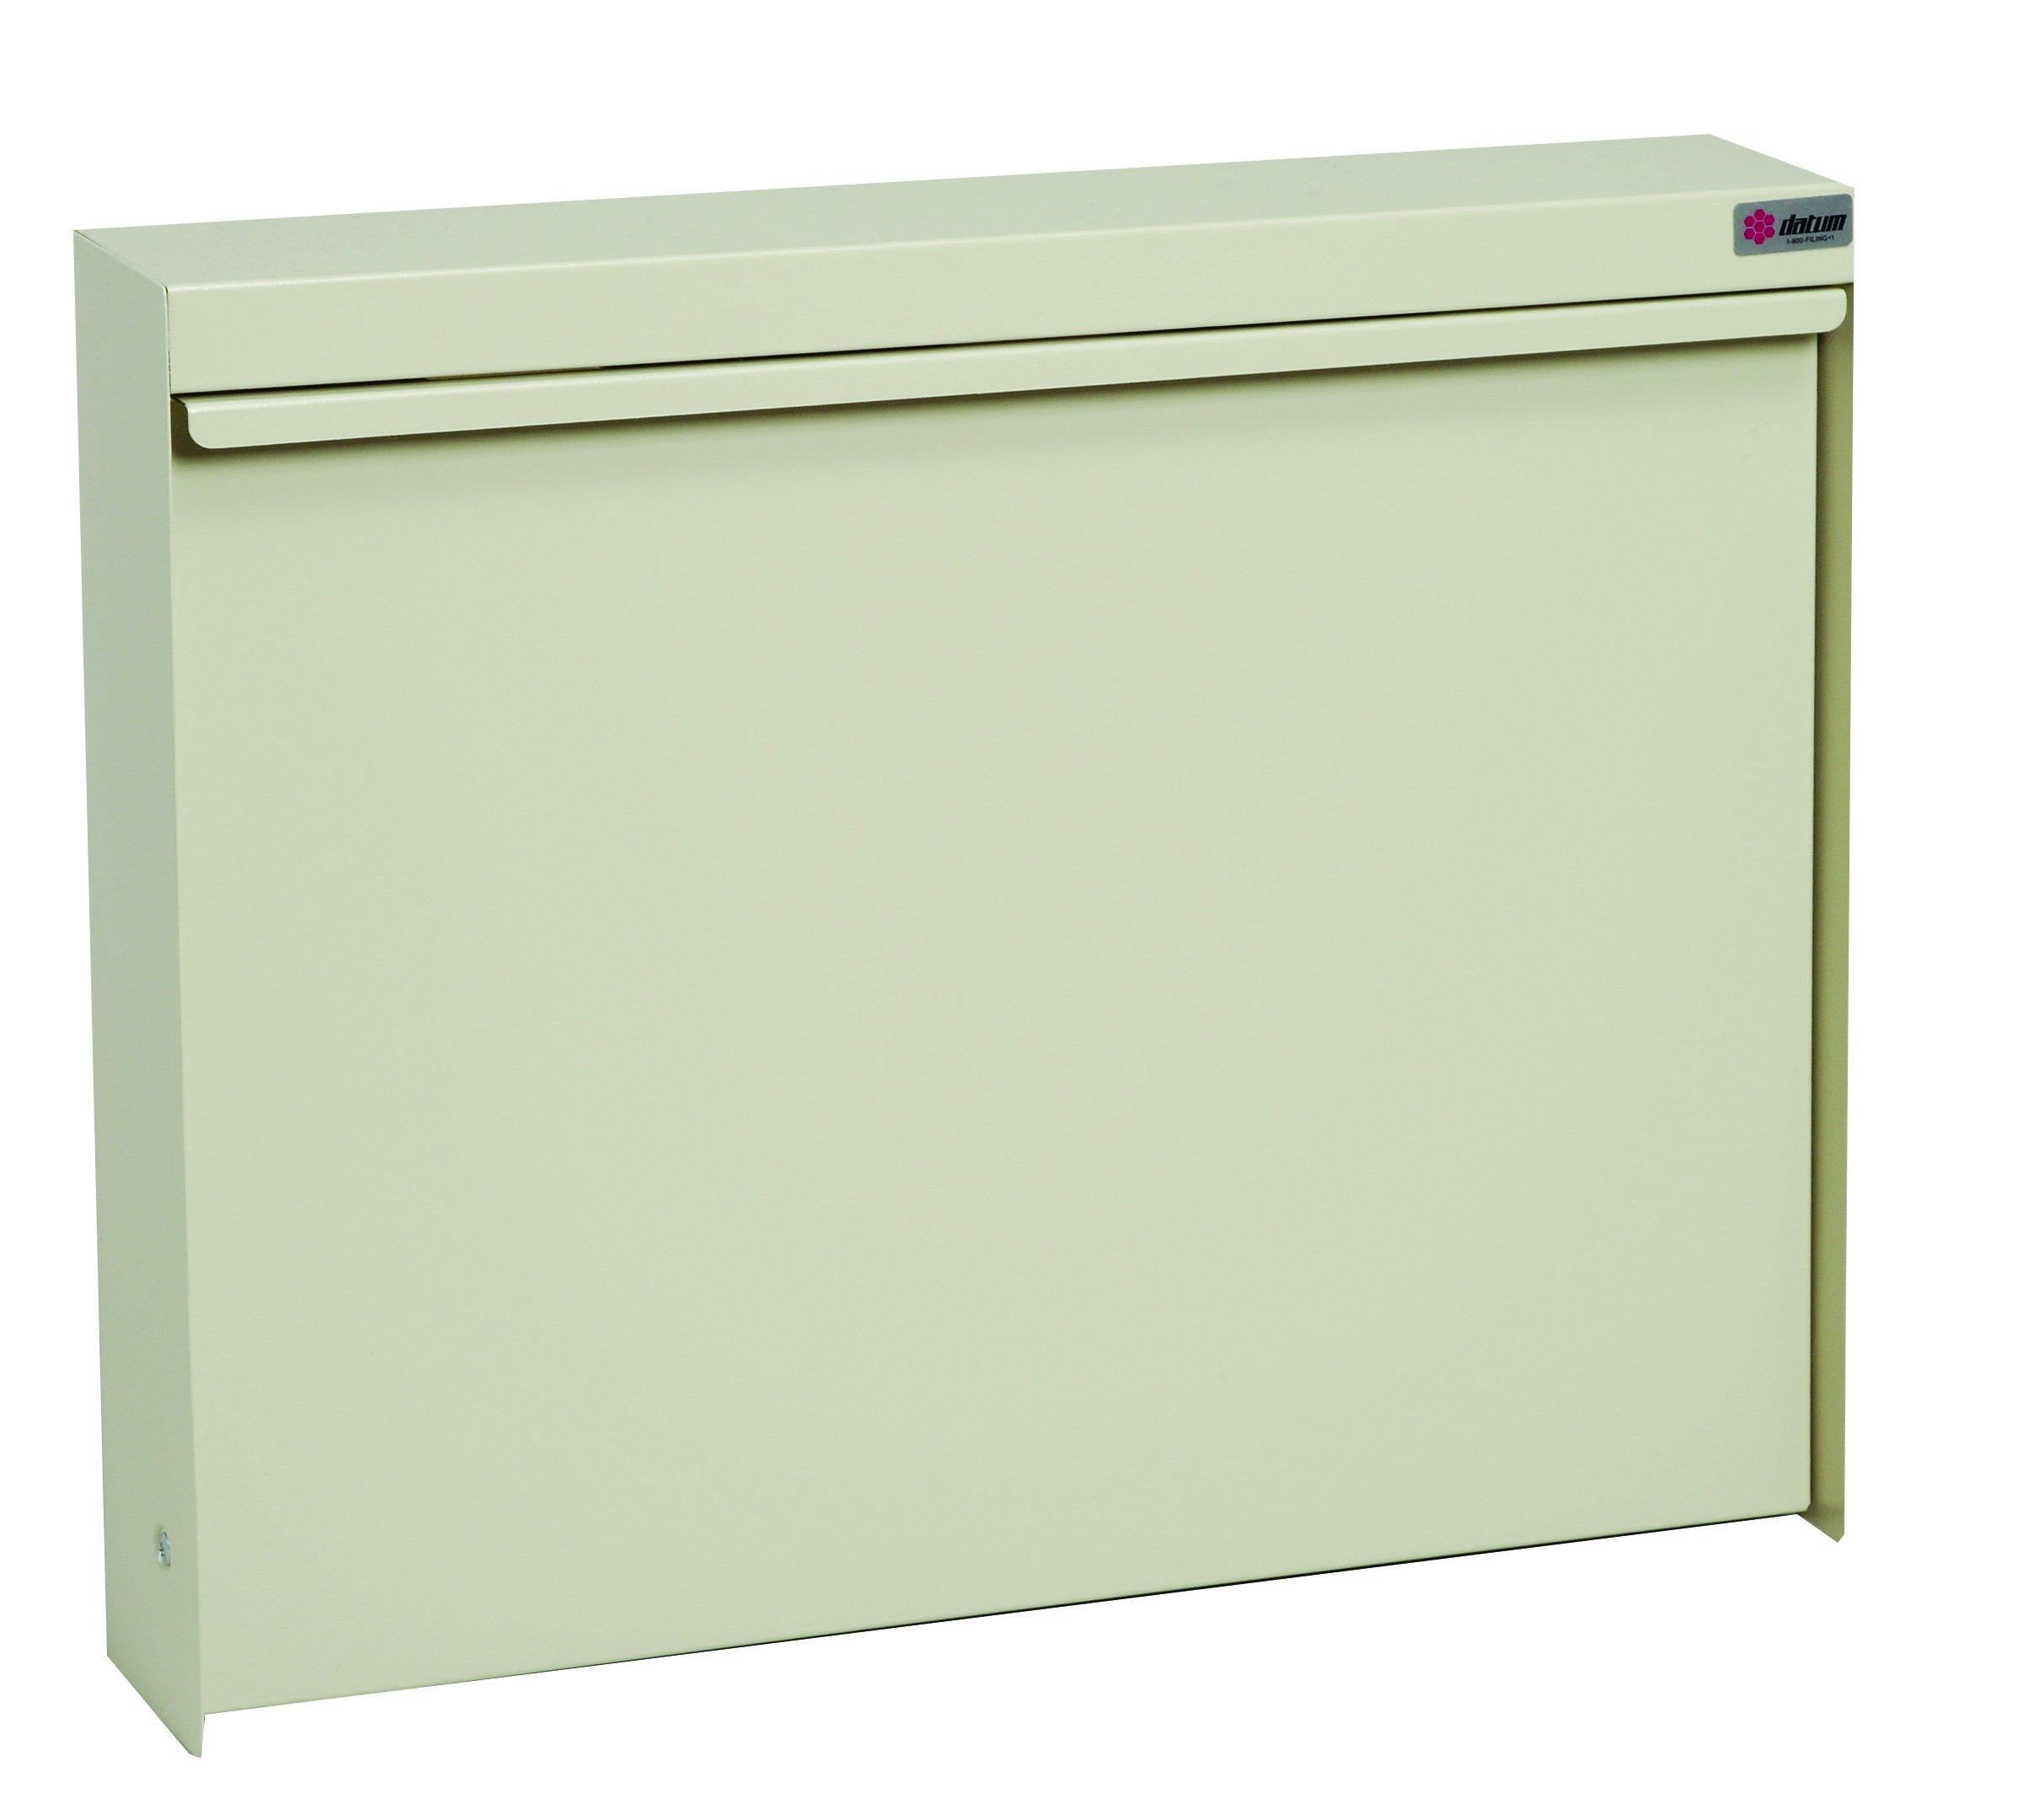 Datum Storage WW-101-T15 WallWrite Fold up Desk With Standard and Non-Locking, Bone White